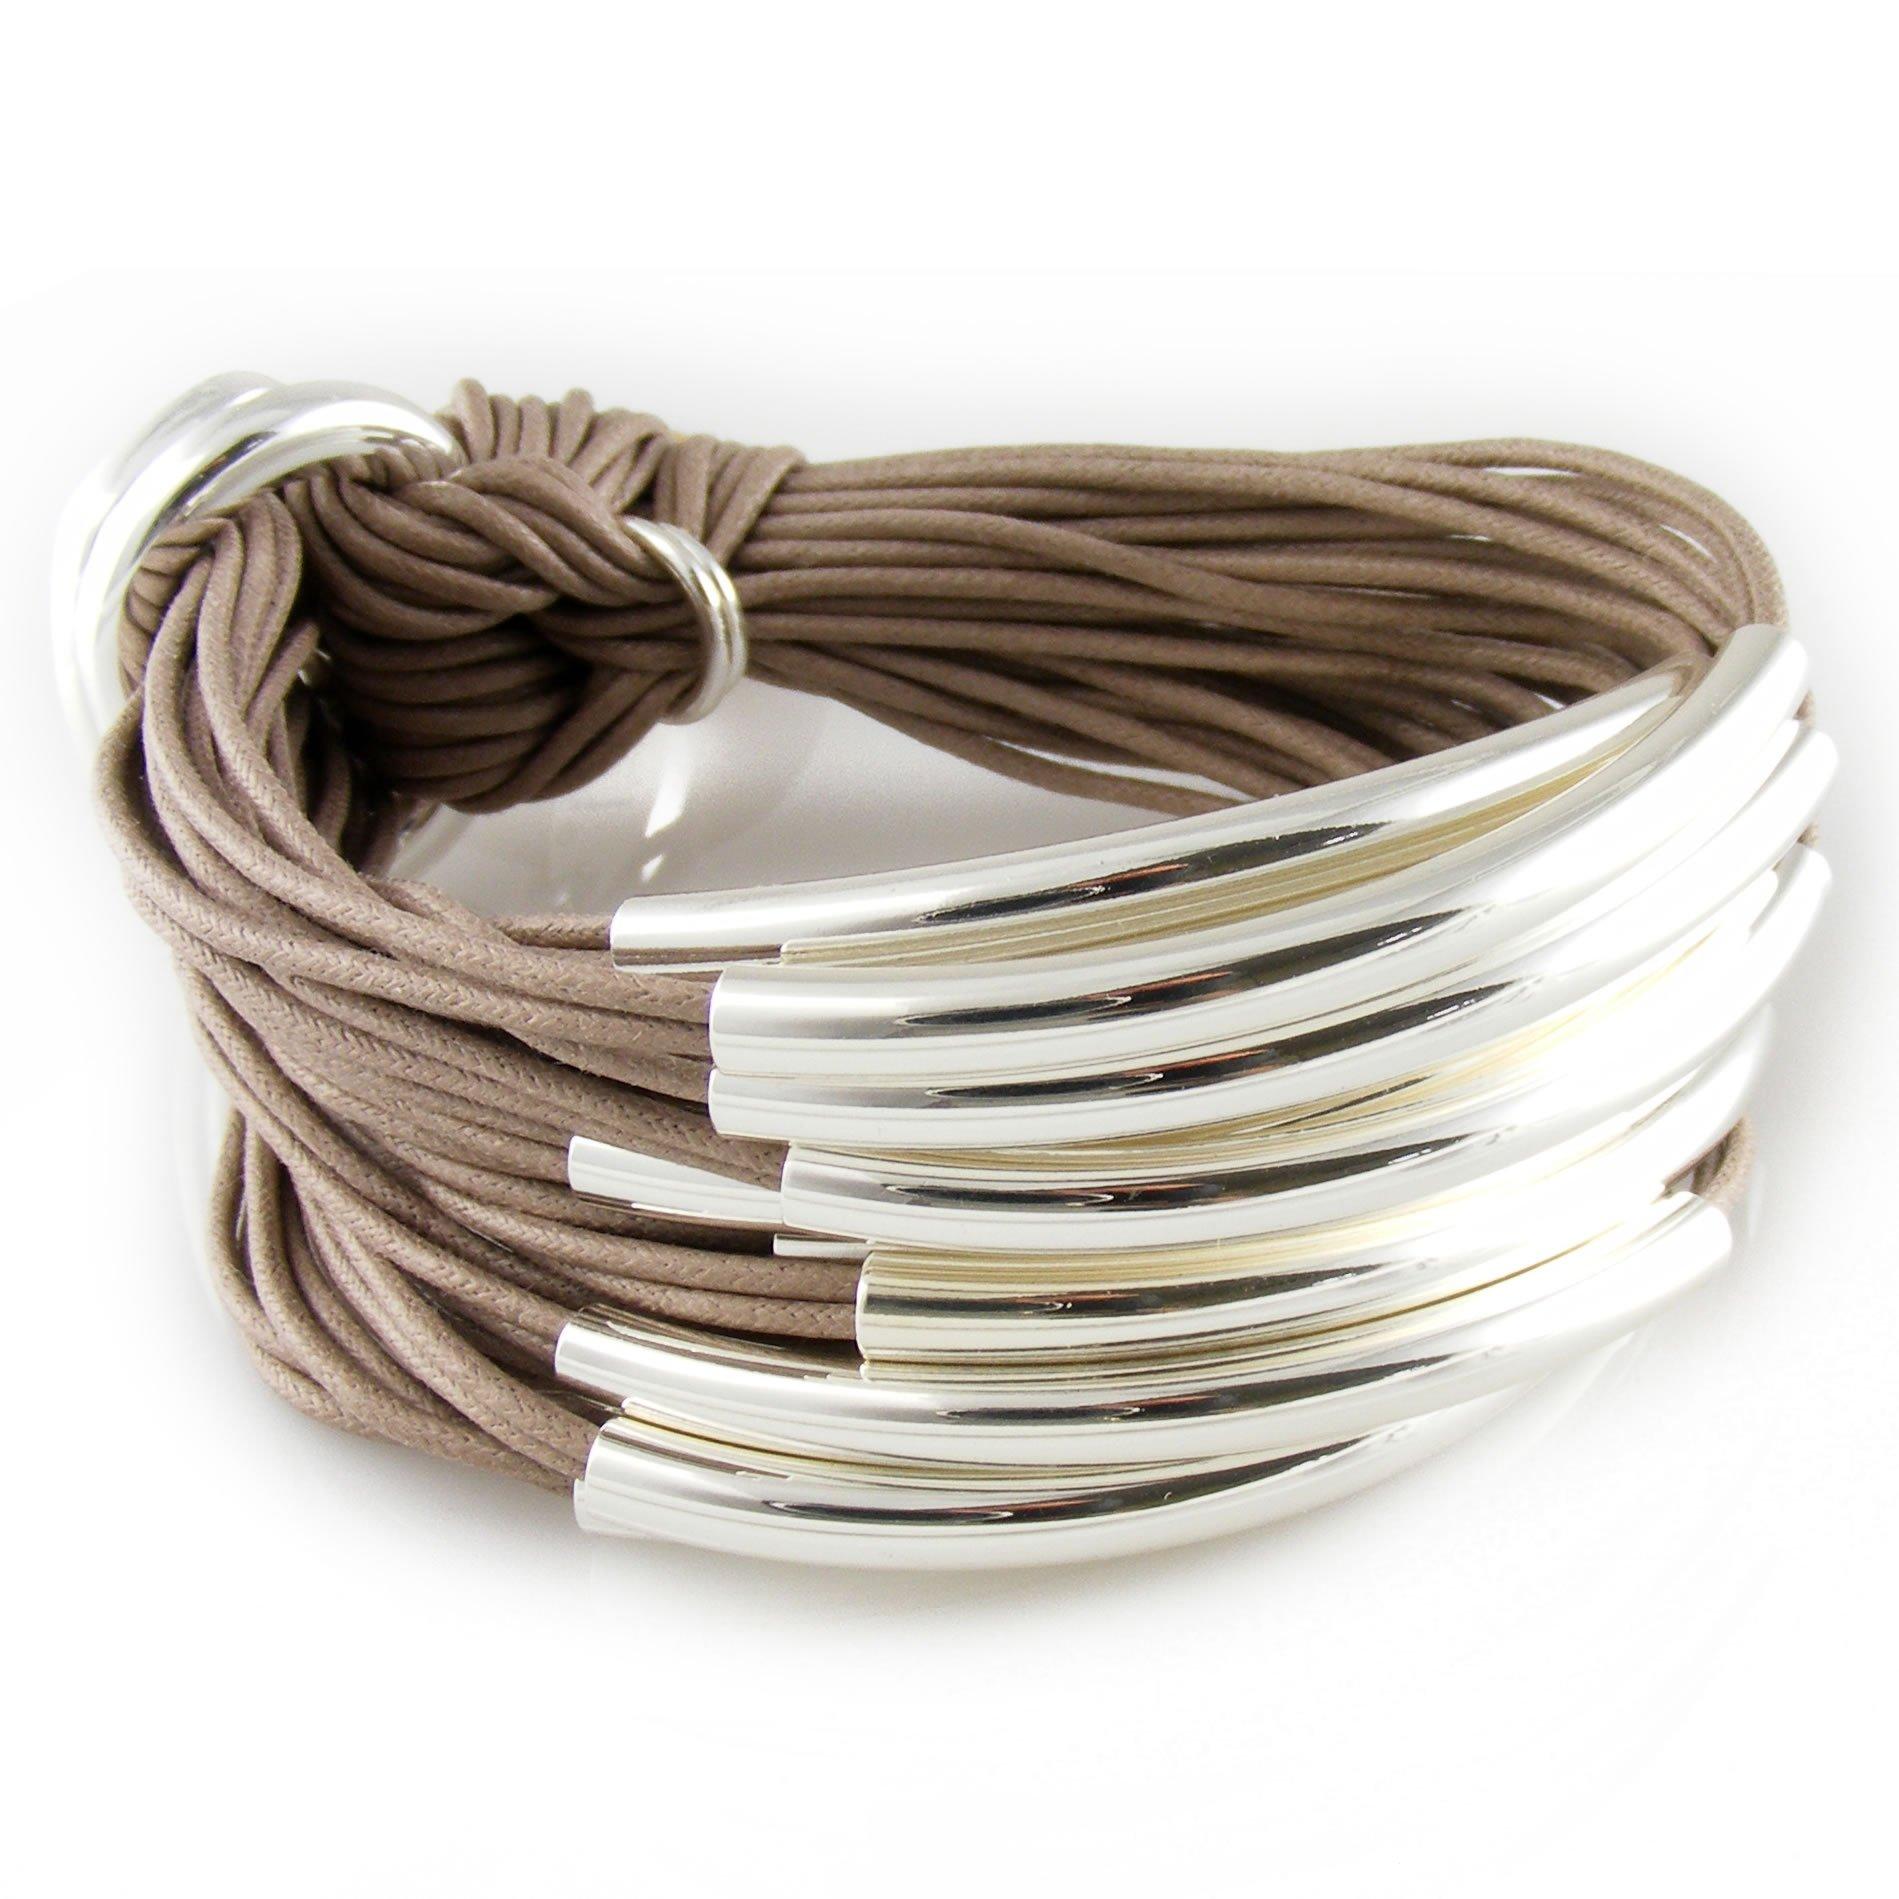 Gillian Julius Multi Tube Bracelet in Silver and Taupe